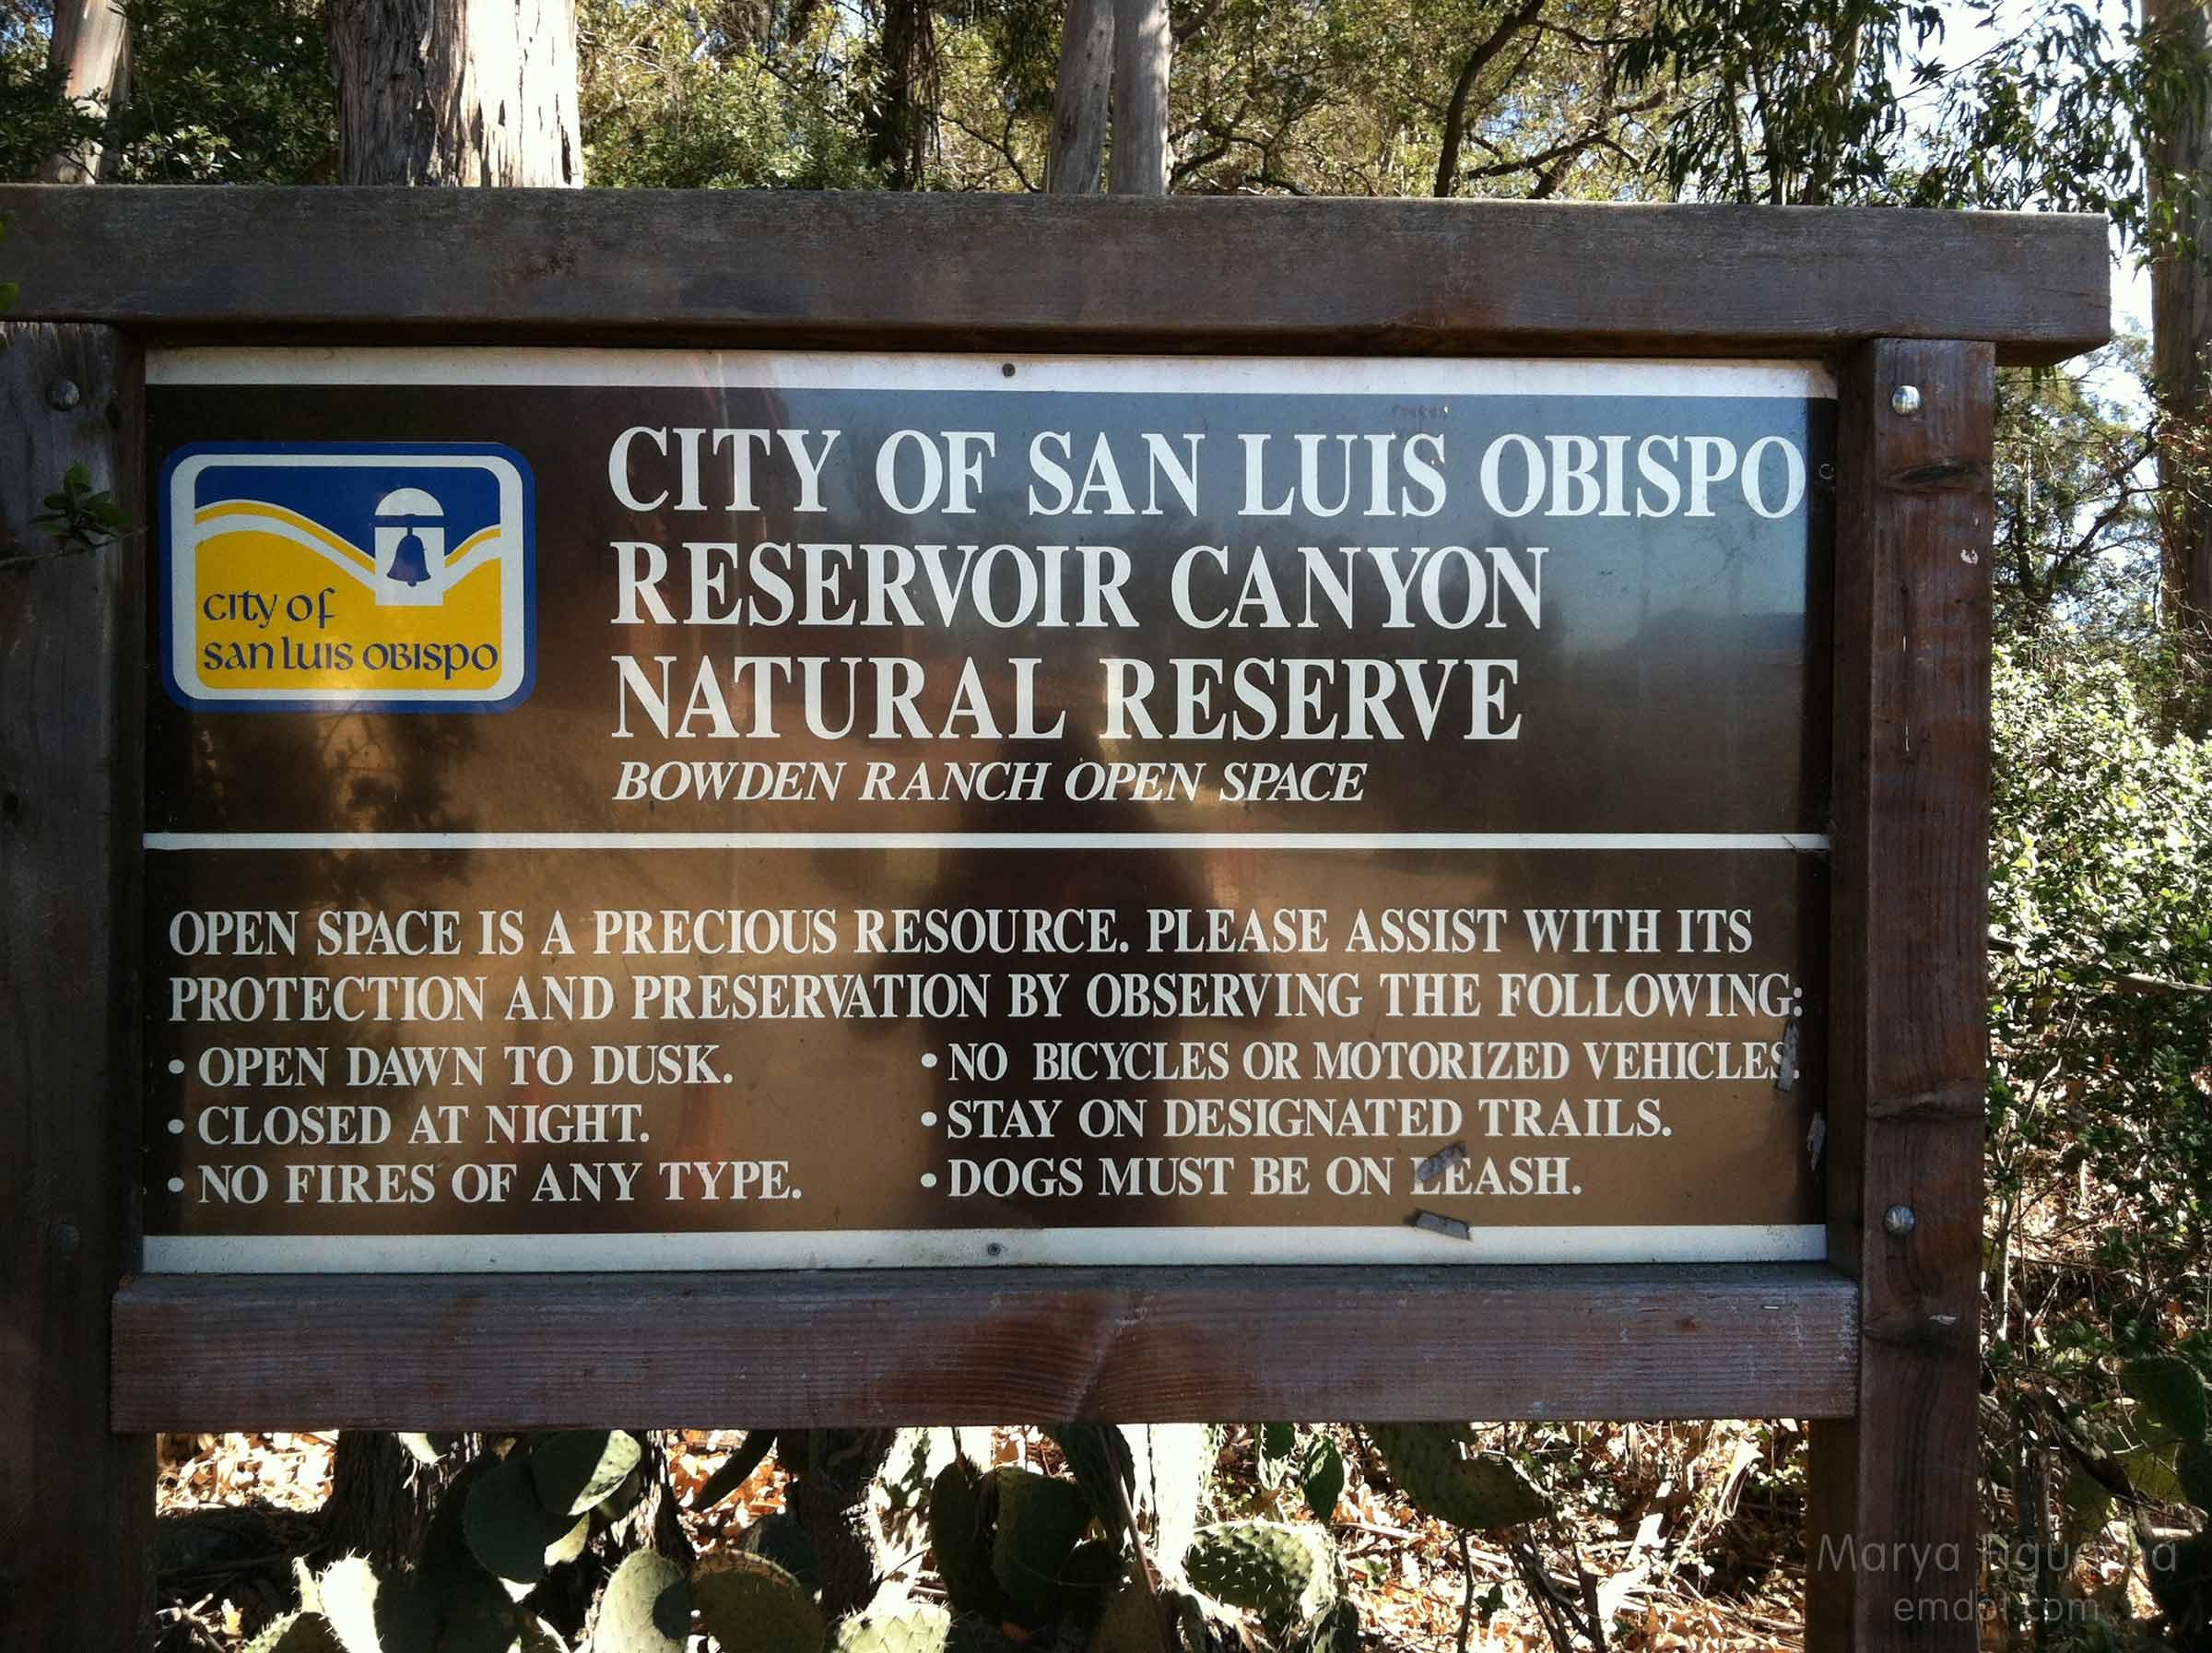 resevoir canyon natural reserve